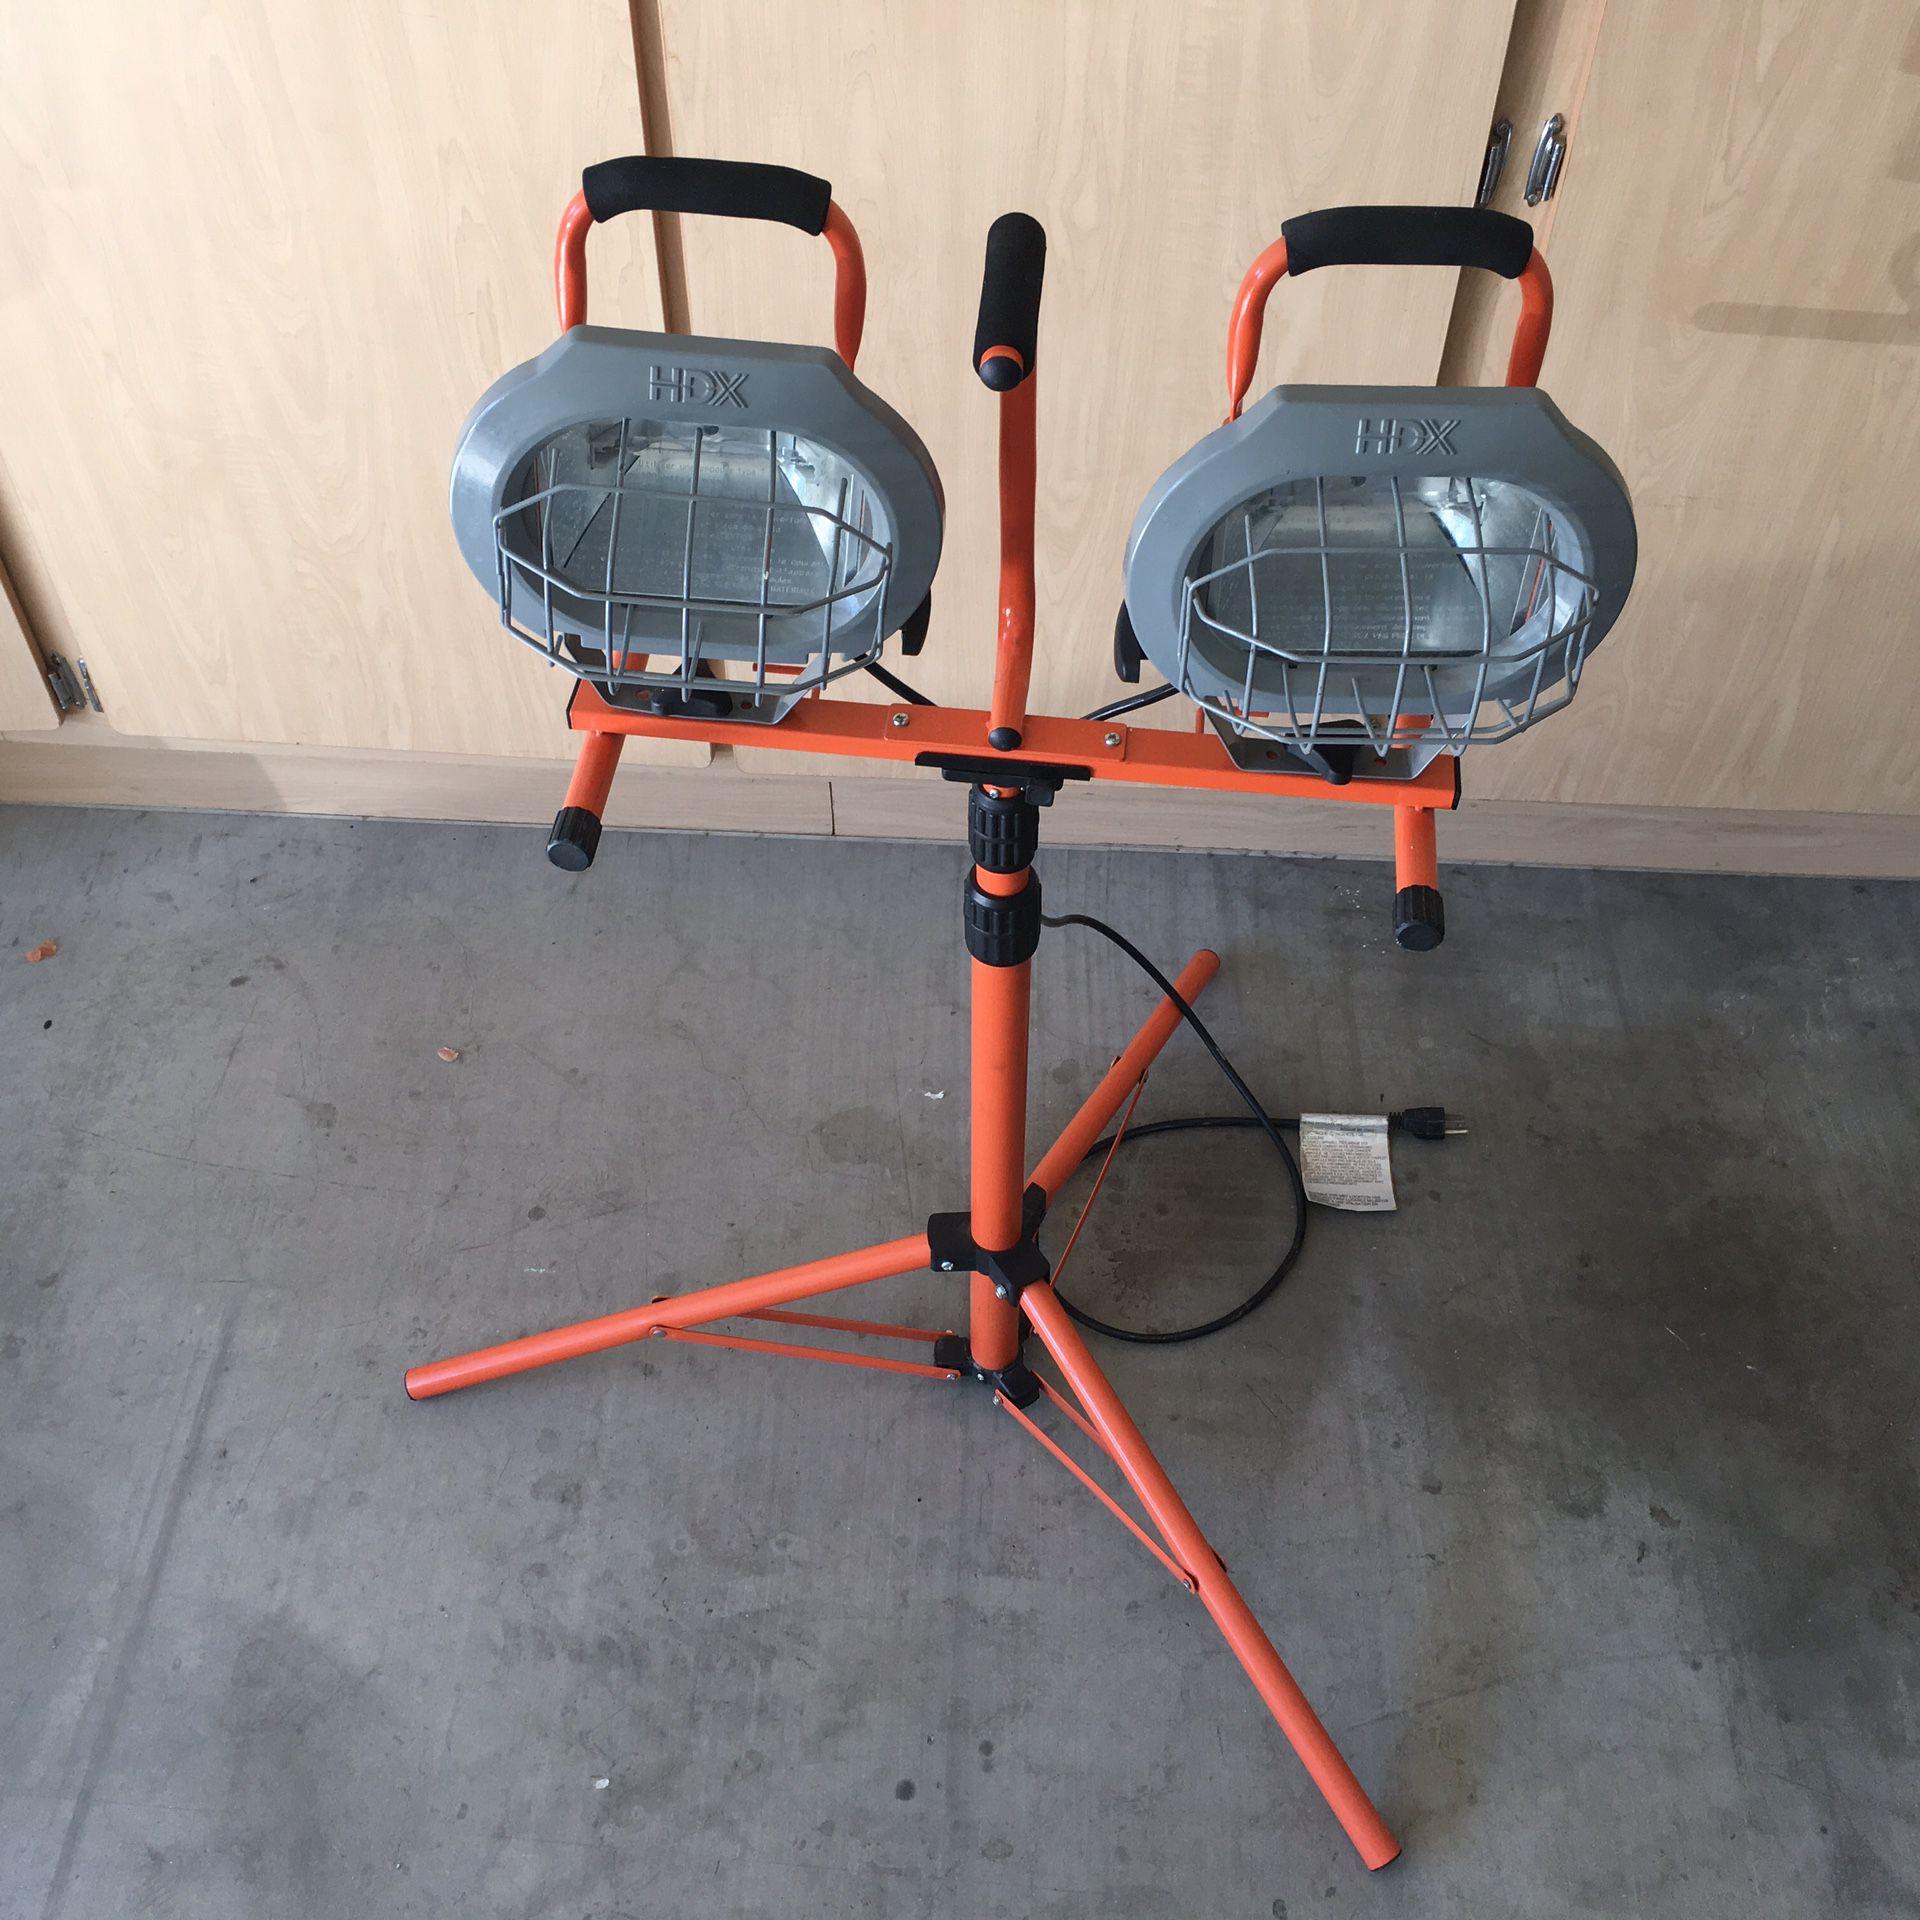 HDX 1000 watts Halogen Tripod Shop Work light